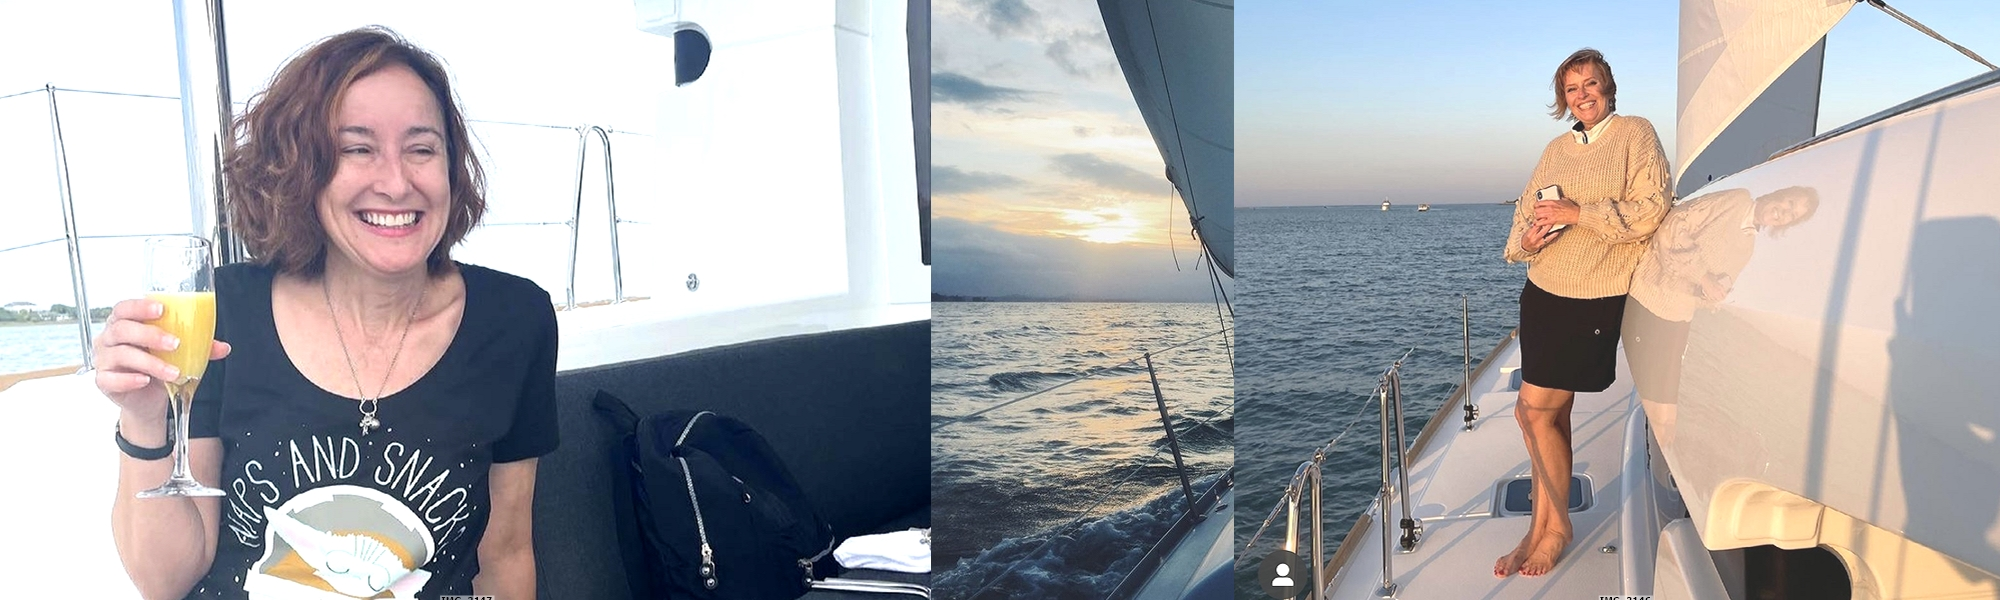 saint aug sailing portraits